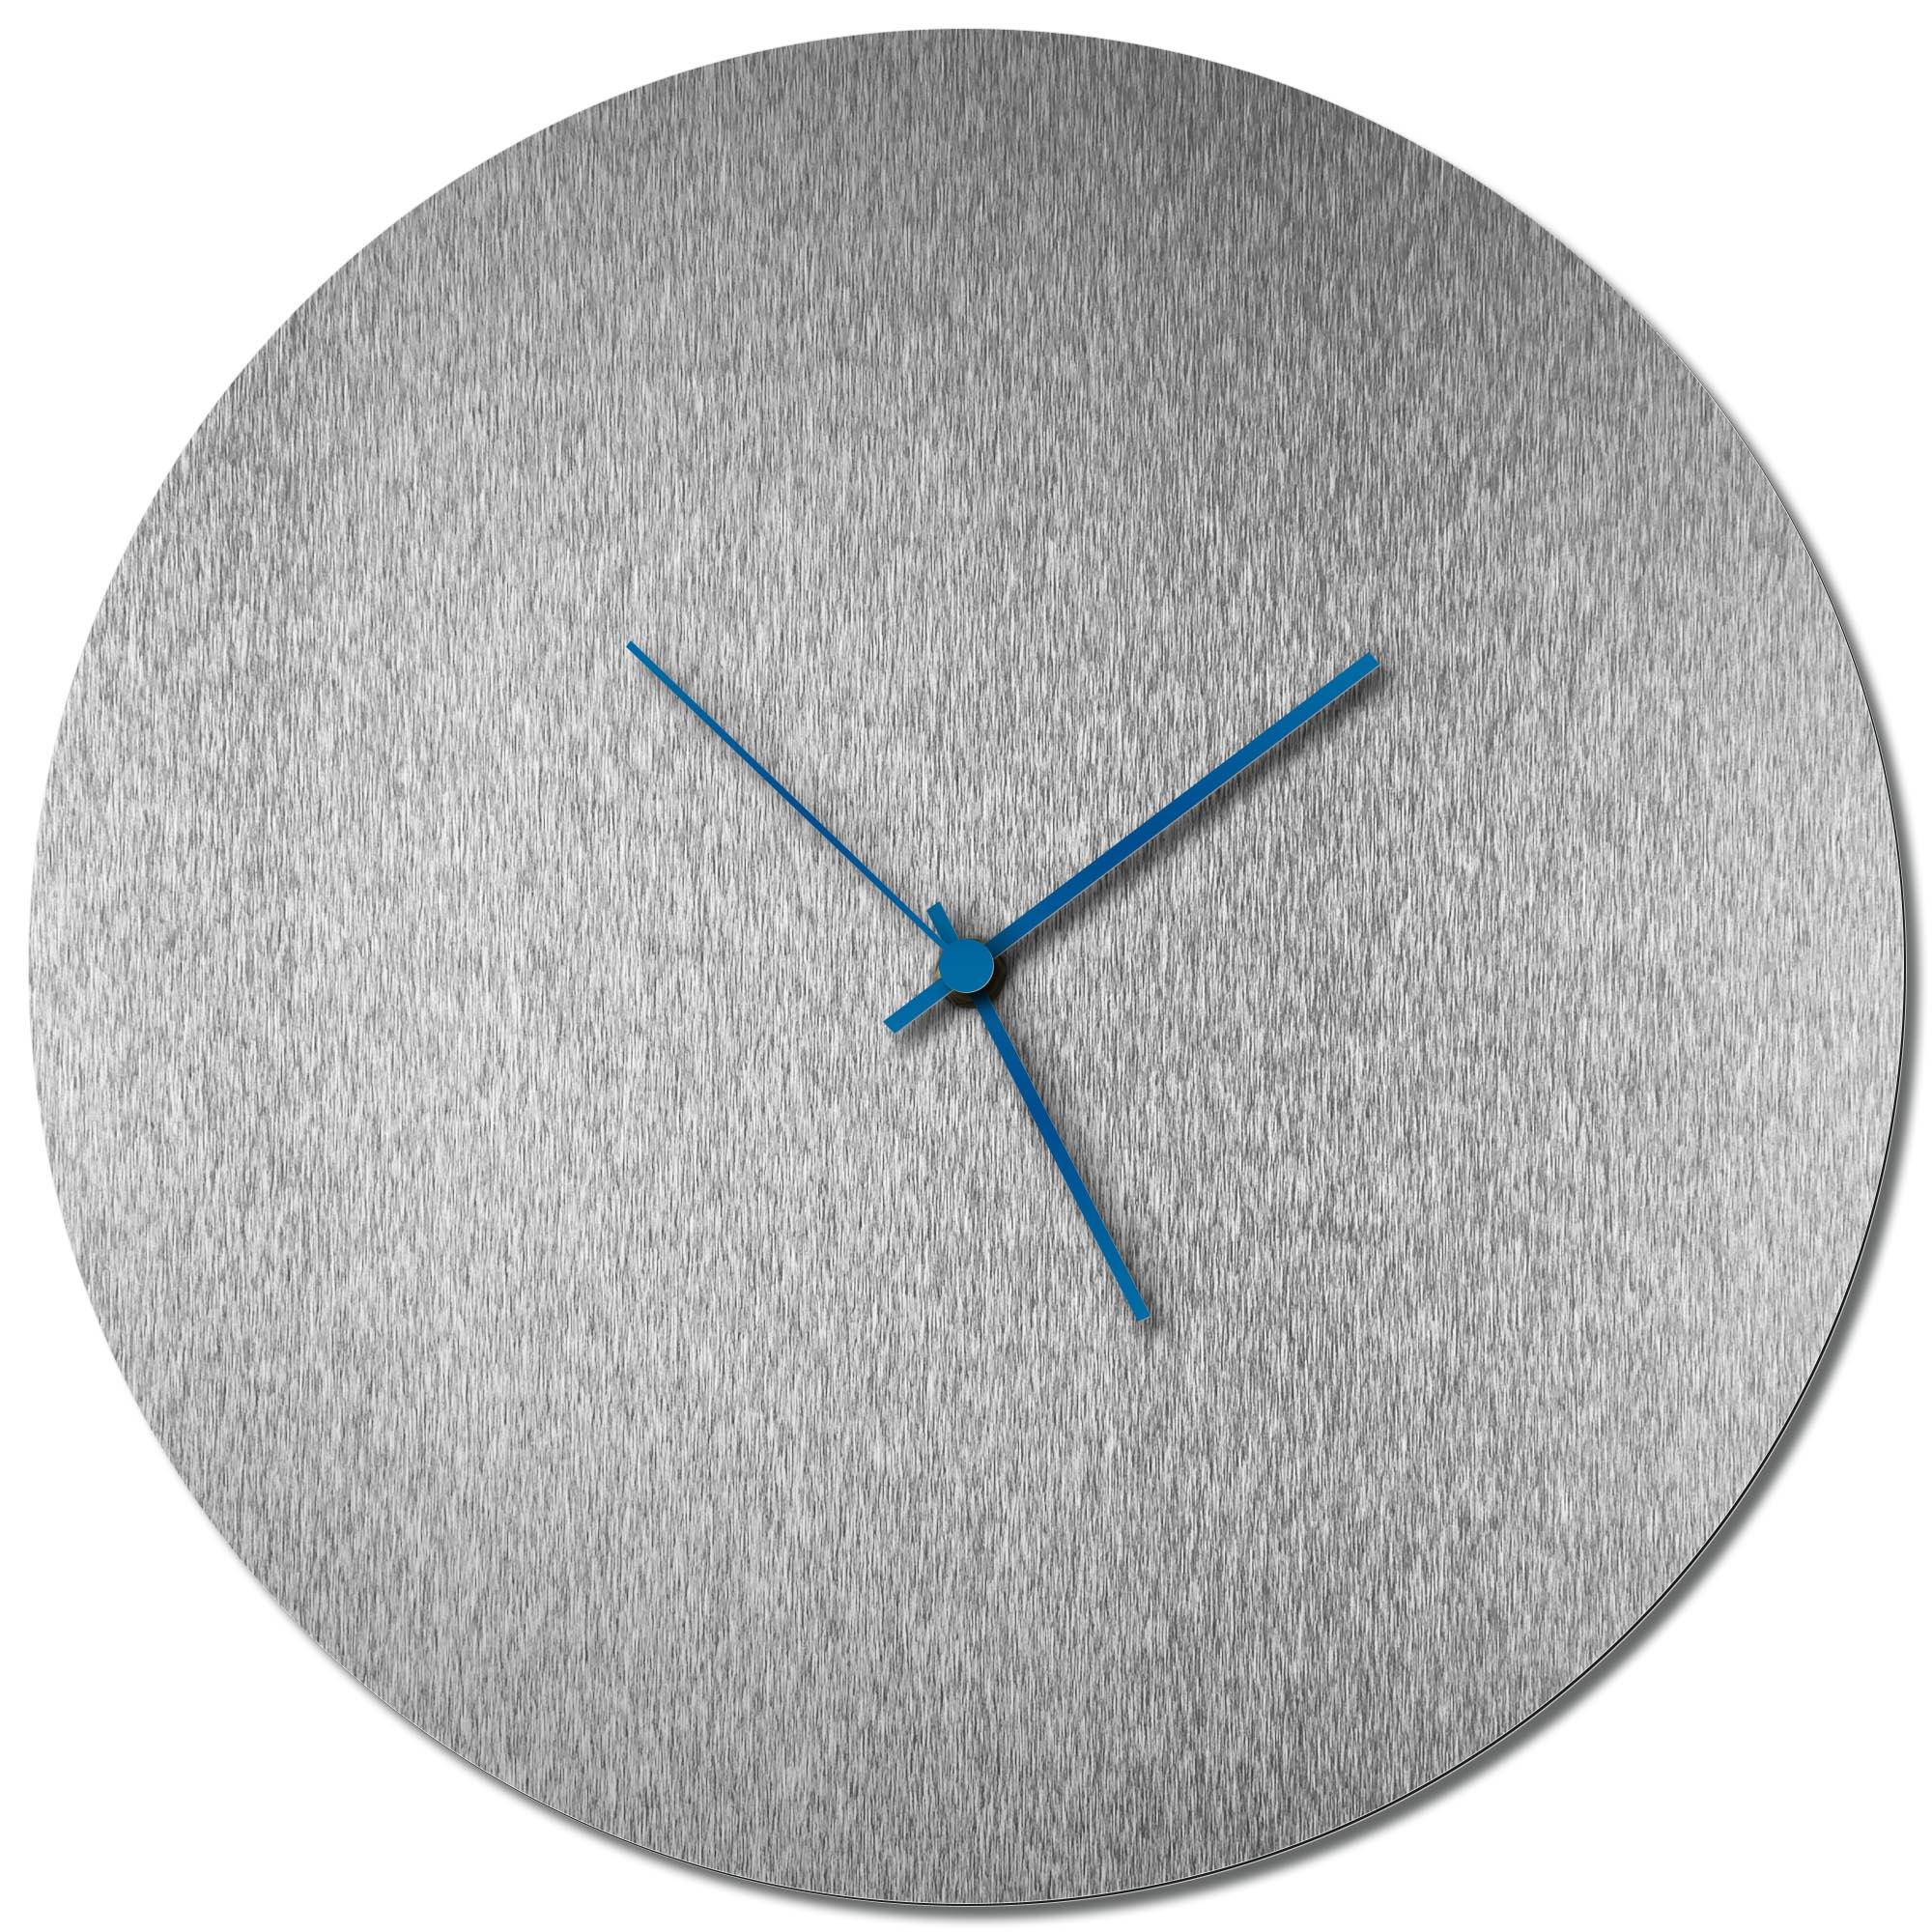 Adam Schwoeppe 'Silversmith Circle Clock Blue' Midcentury Modern Style Wall Clock